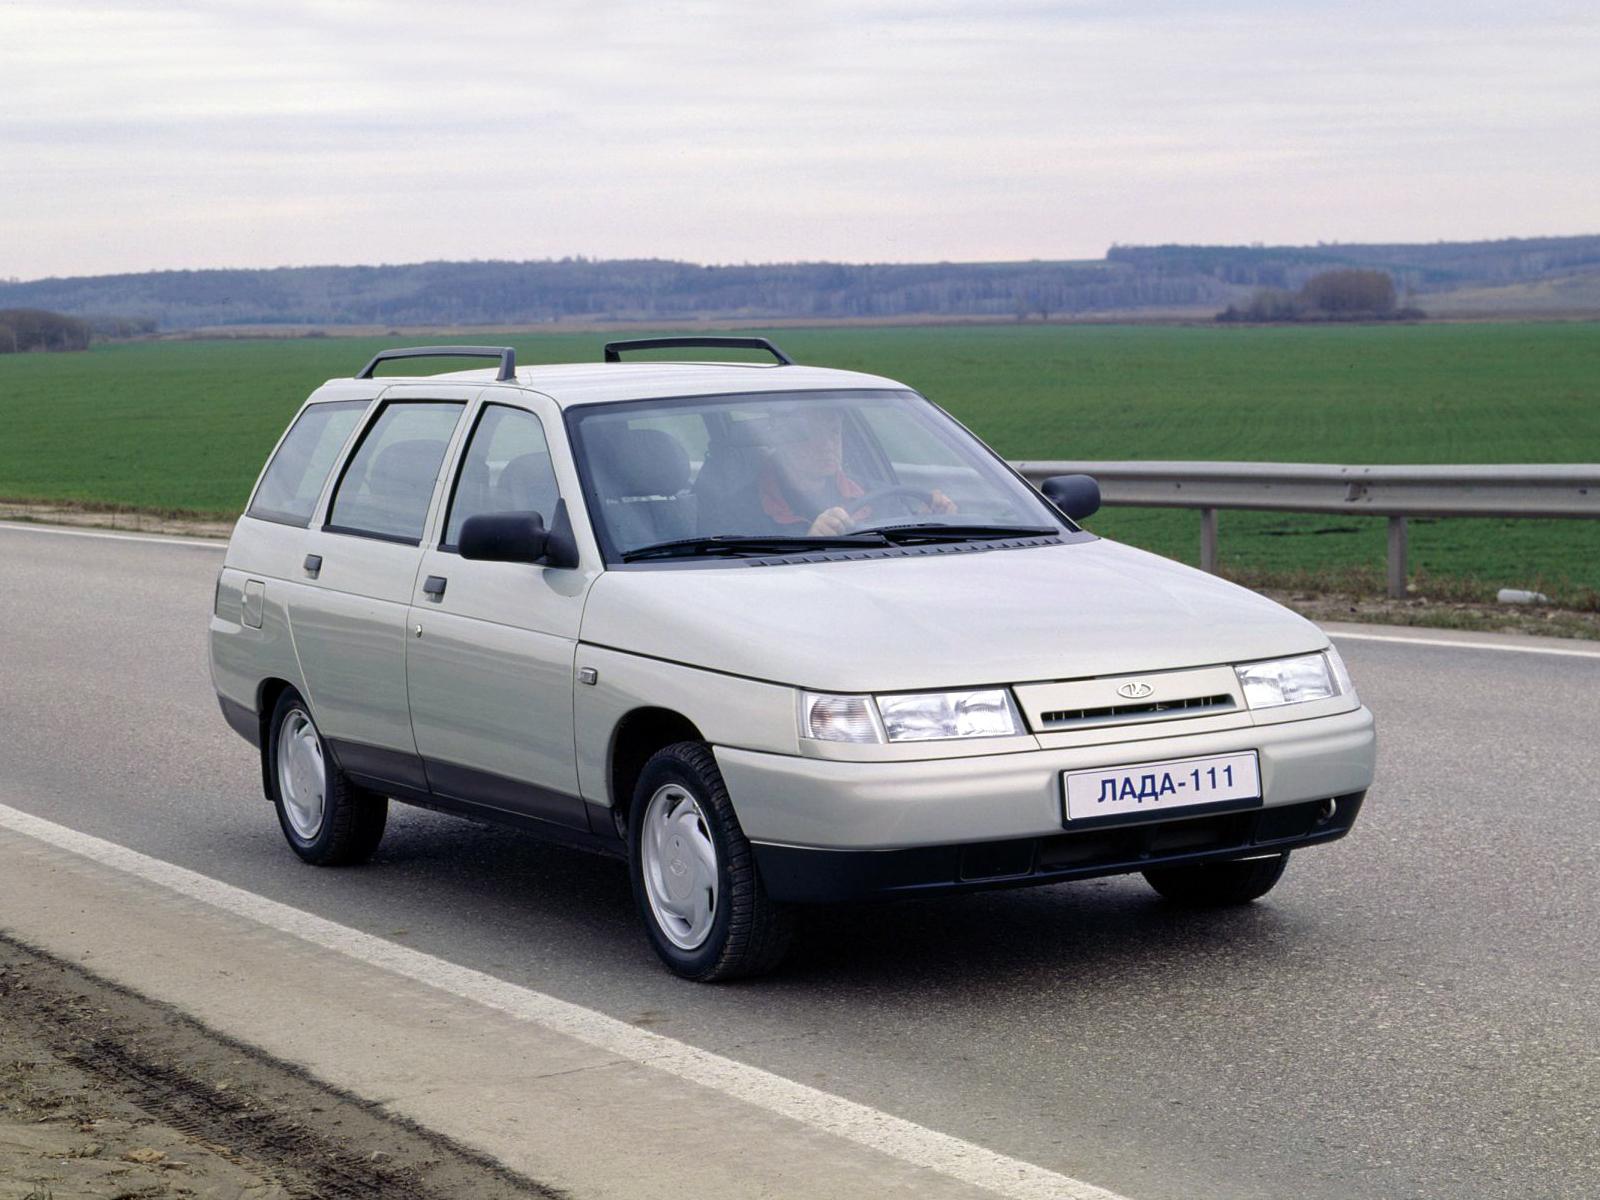 Машина 11 модель фото цена